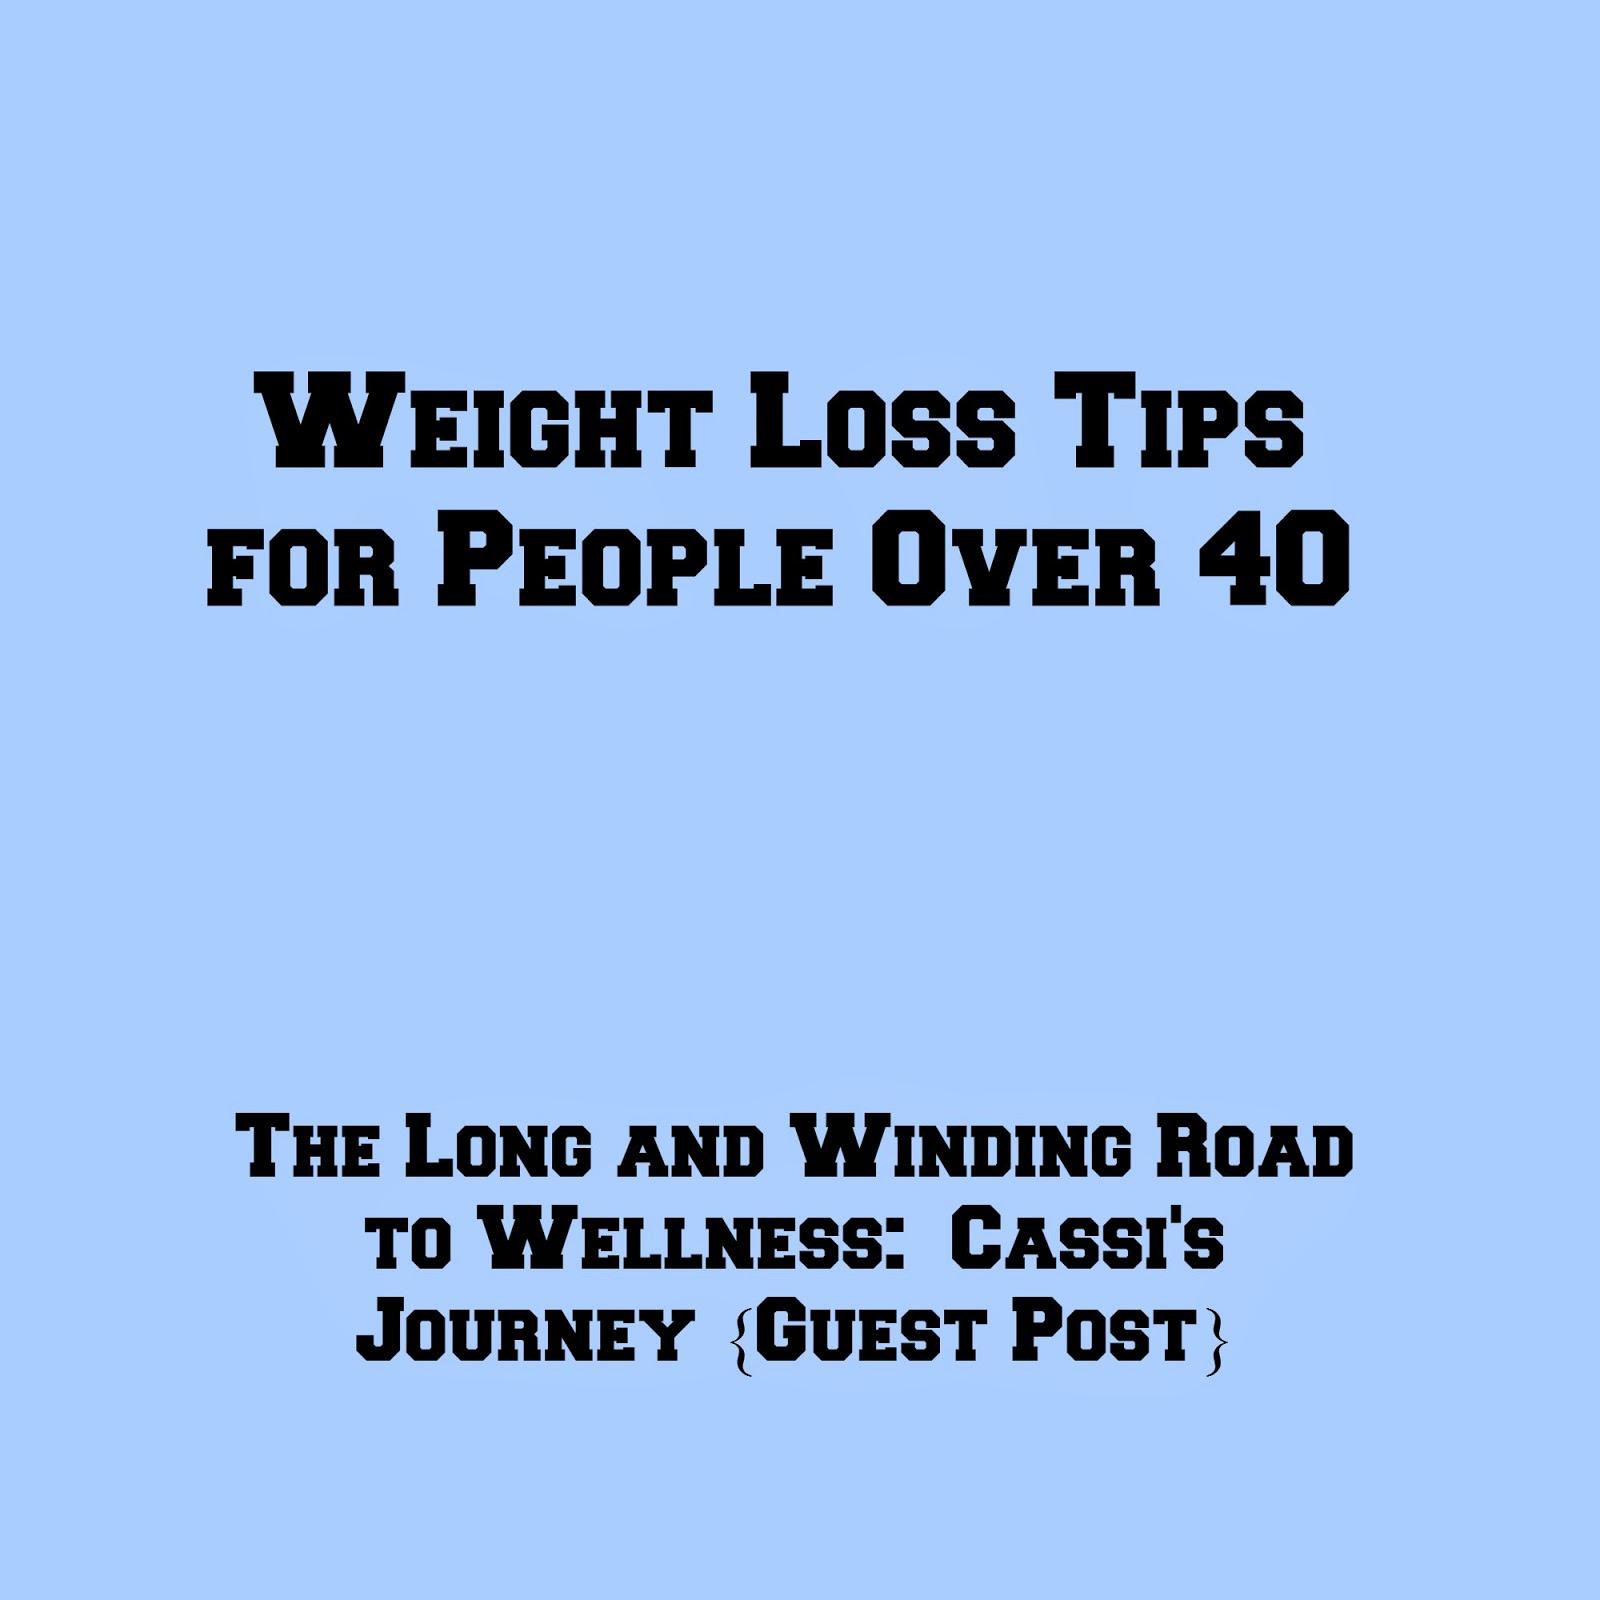 weight loss tips.jpg